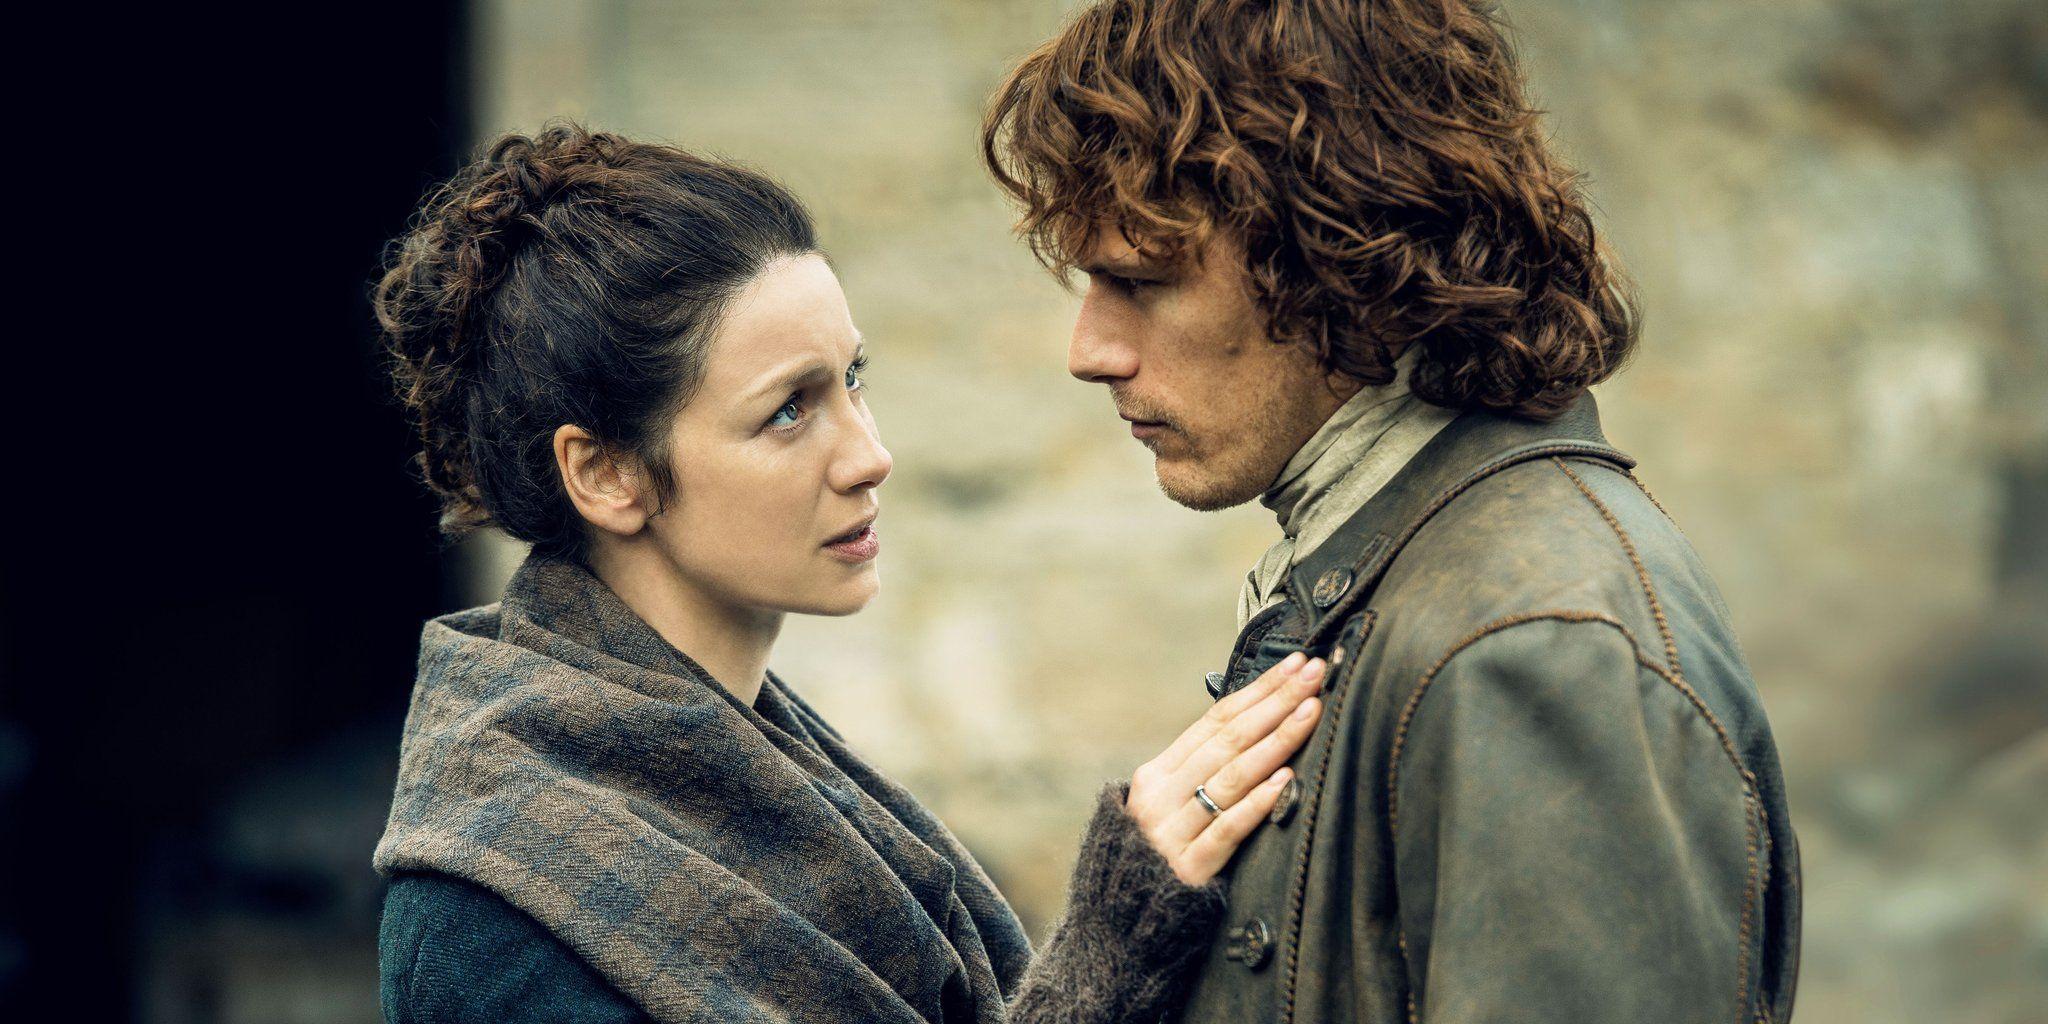 Outlander Season 4 News, Rumors, Spoilers